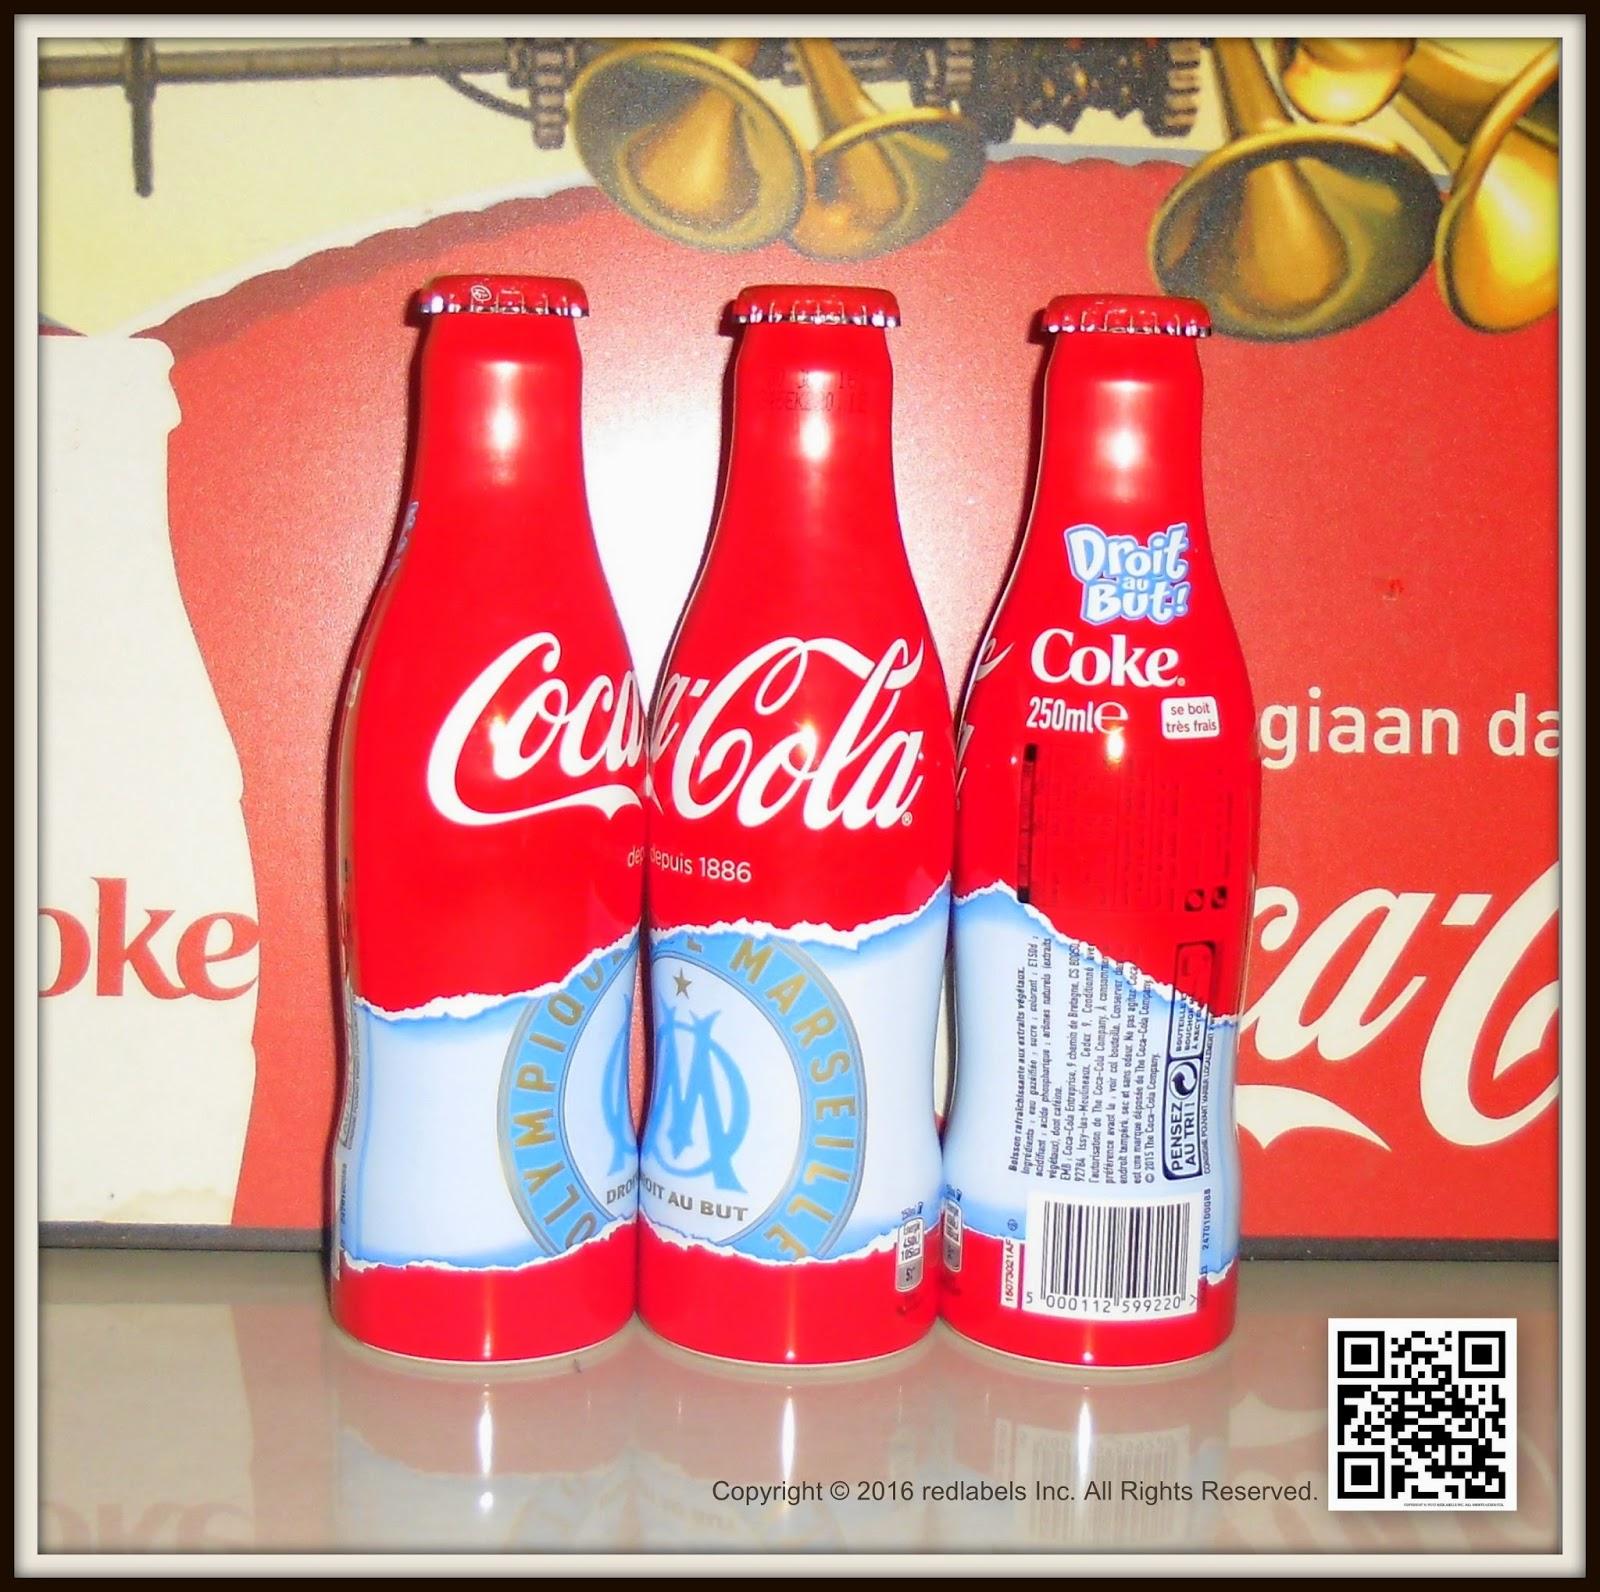 aluminum bottle collector club coca cola olympique de marseille aluminum bottle 2016 france. Black Bedroom Furniture Sets. Home Design Ideas